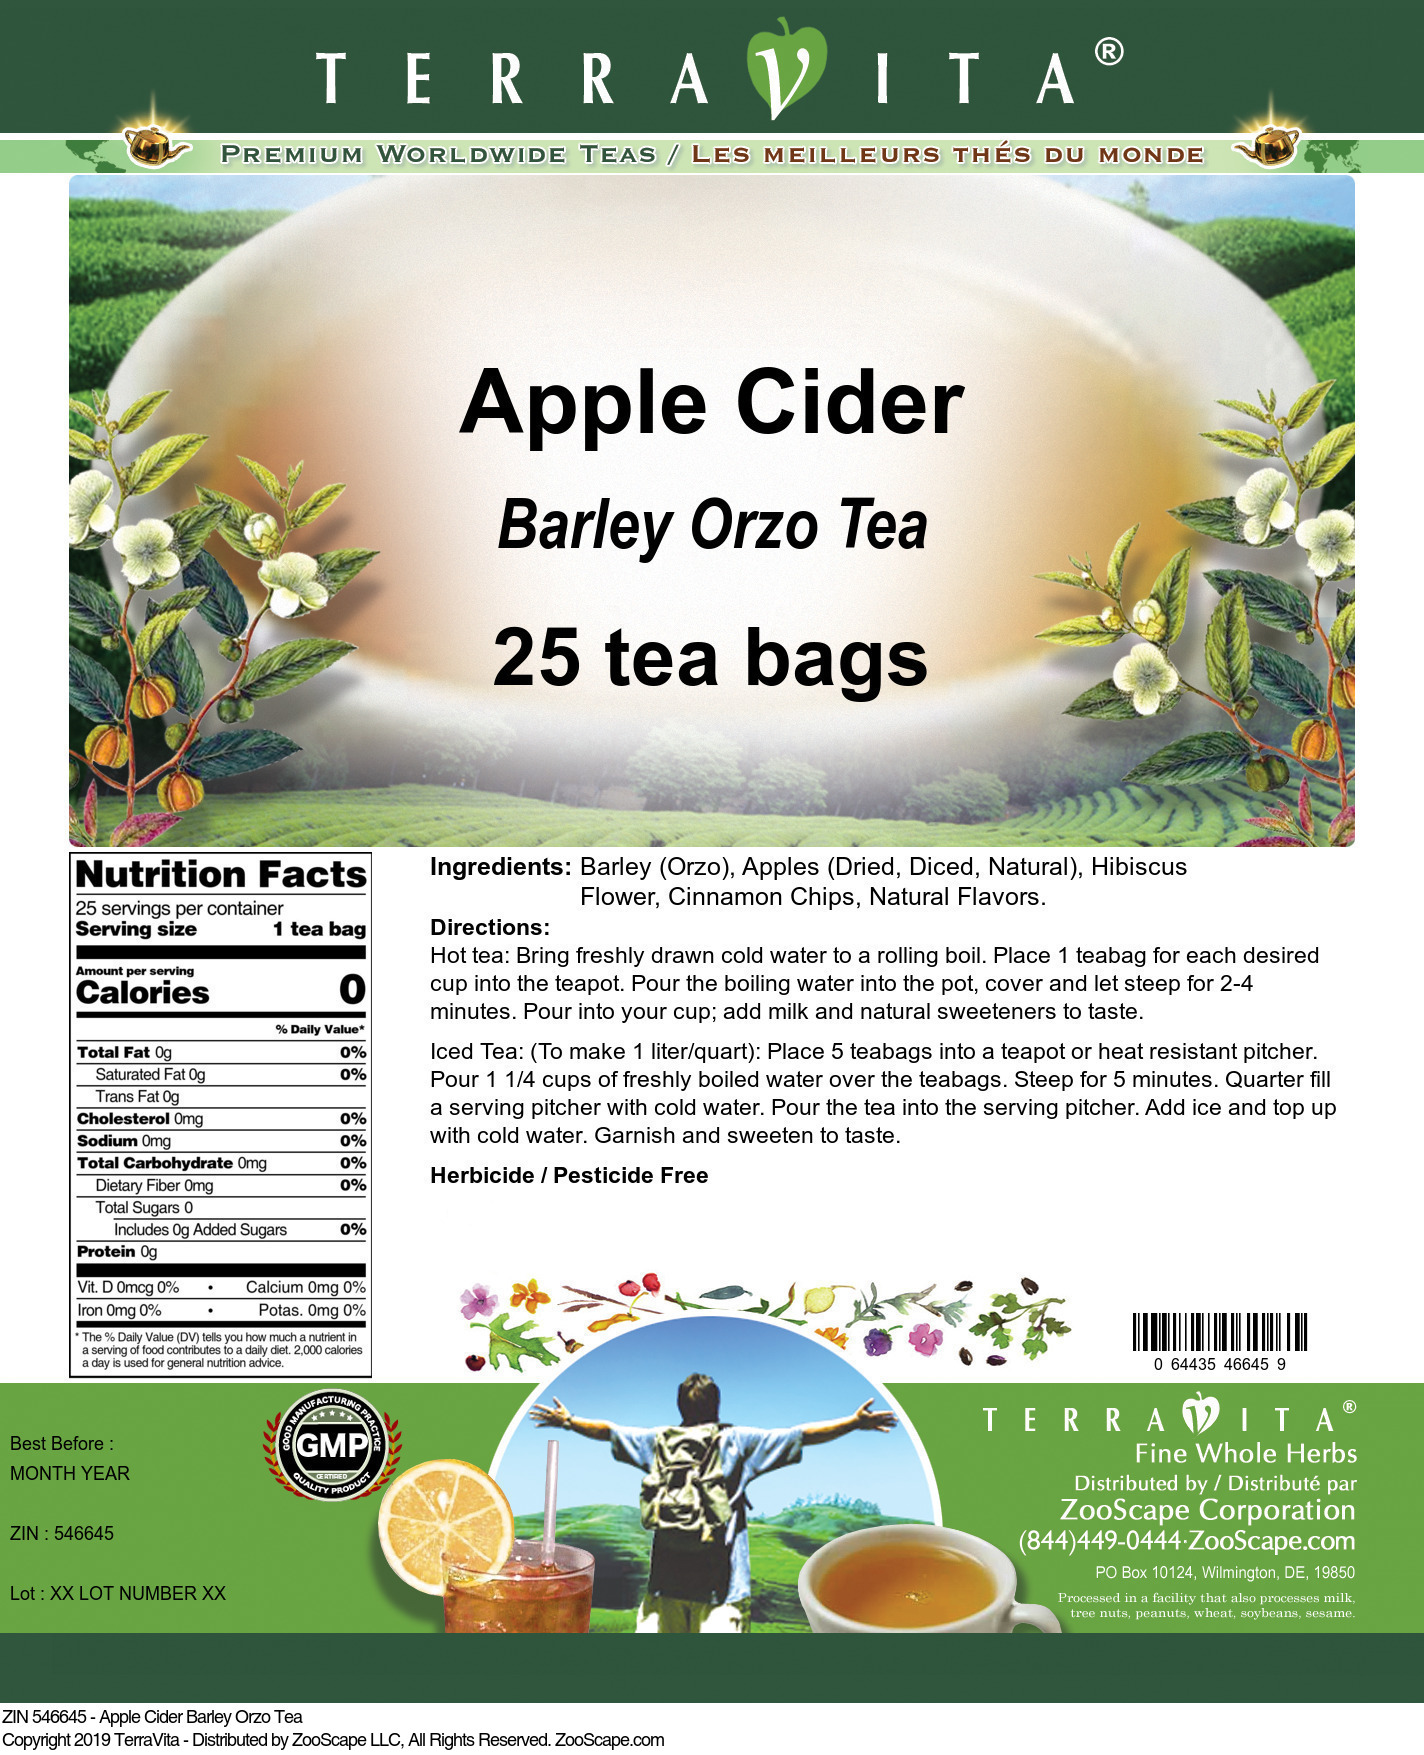 Apple Cider Barley Orzo Tea